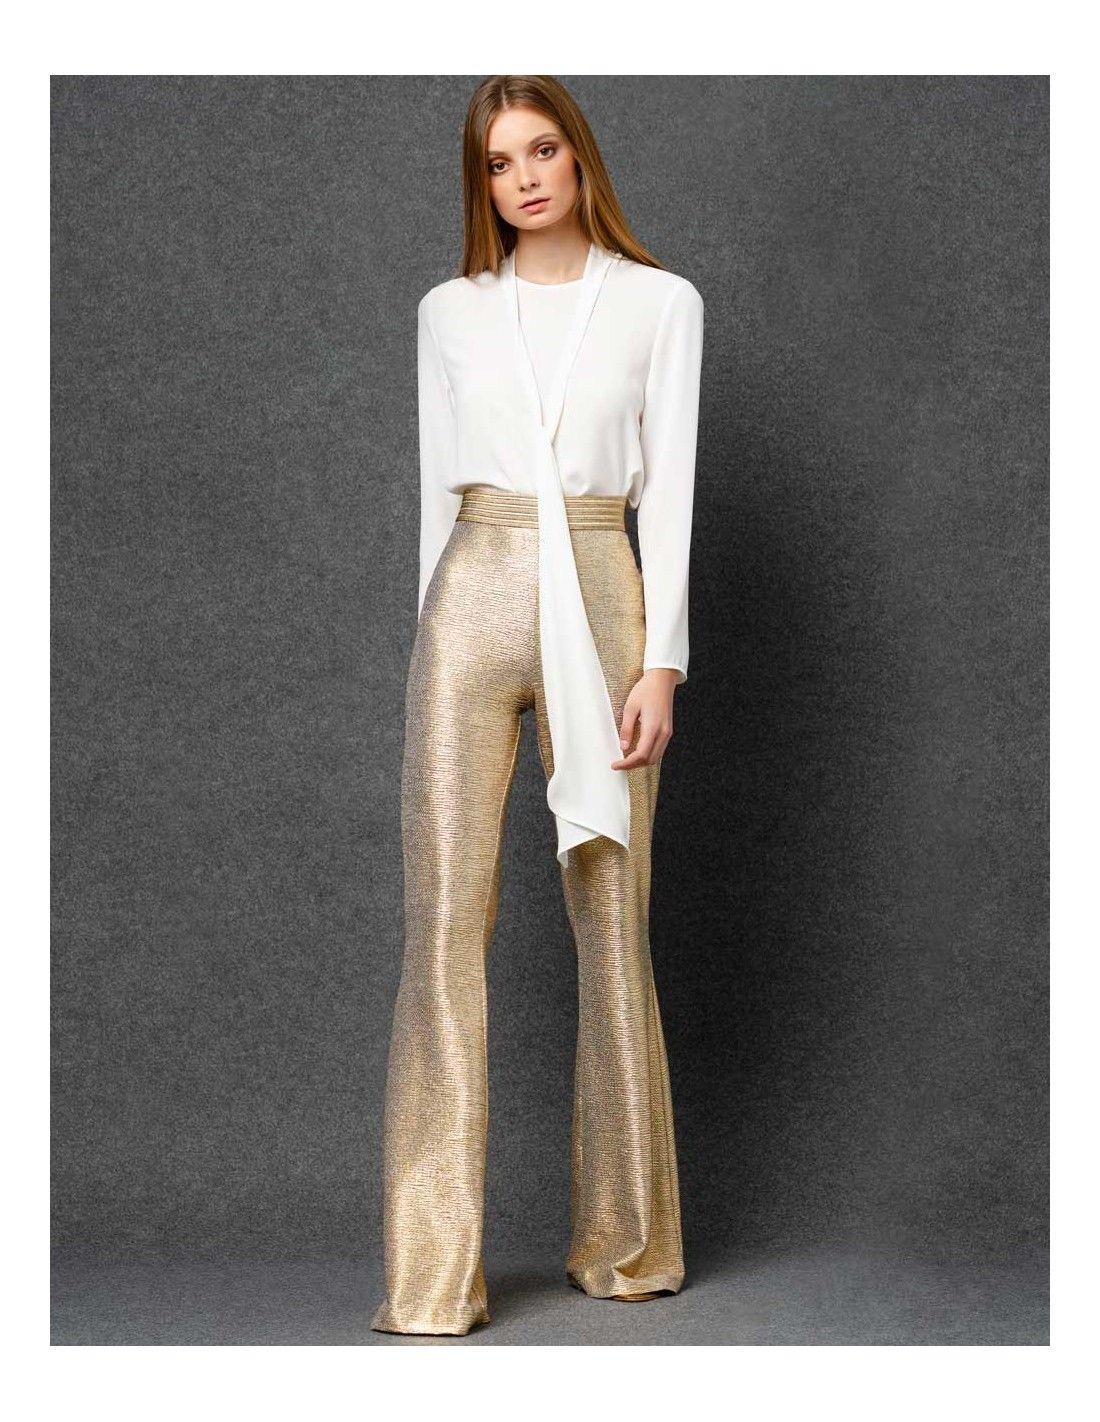 Pantalon De Fiesta Dorado In 2021 Outfits Fashion Metal Clothing